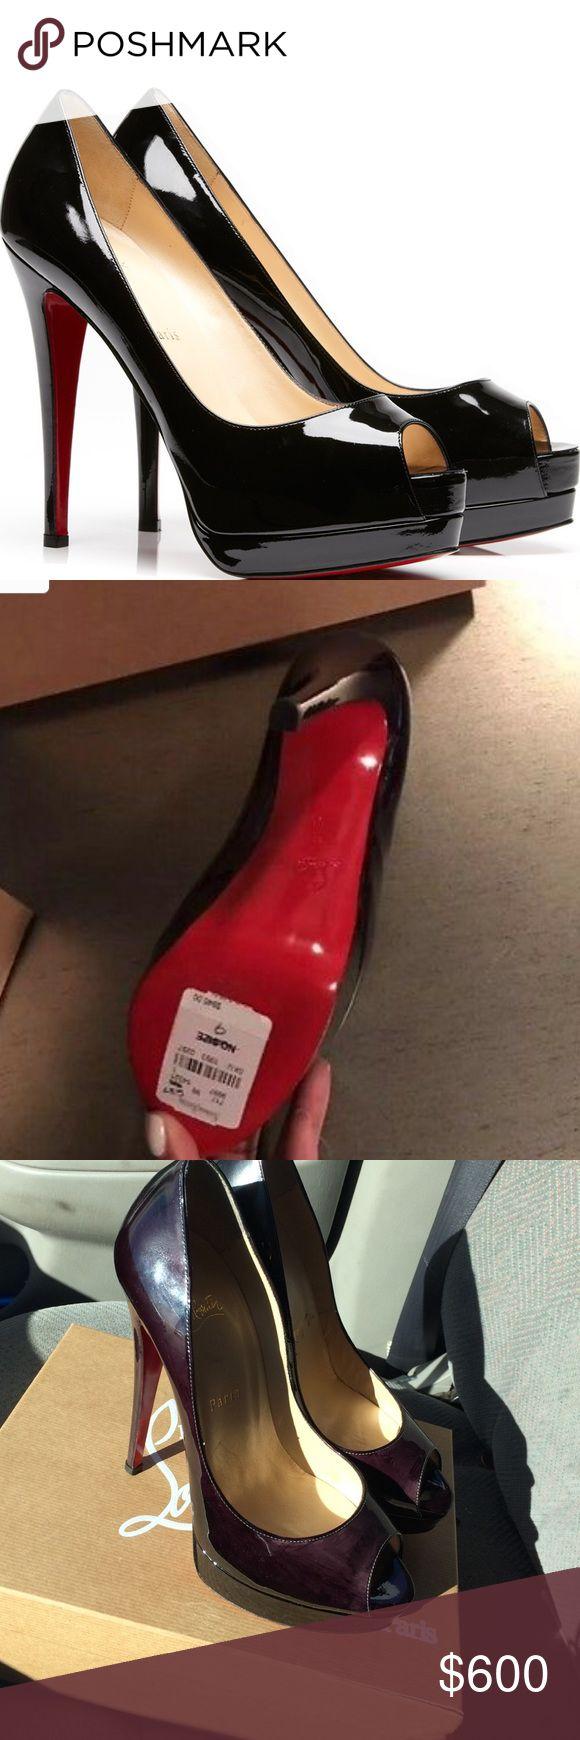 Christian Louboutin Peep Toe BLACK Black patent leather peep toe Christian Louboutin pump size 39.... BRAND NEW.... retail price $945 Christian Louboutin Shoes Heels